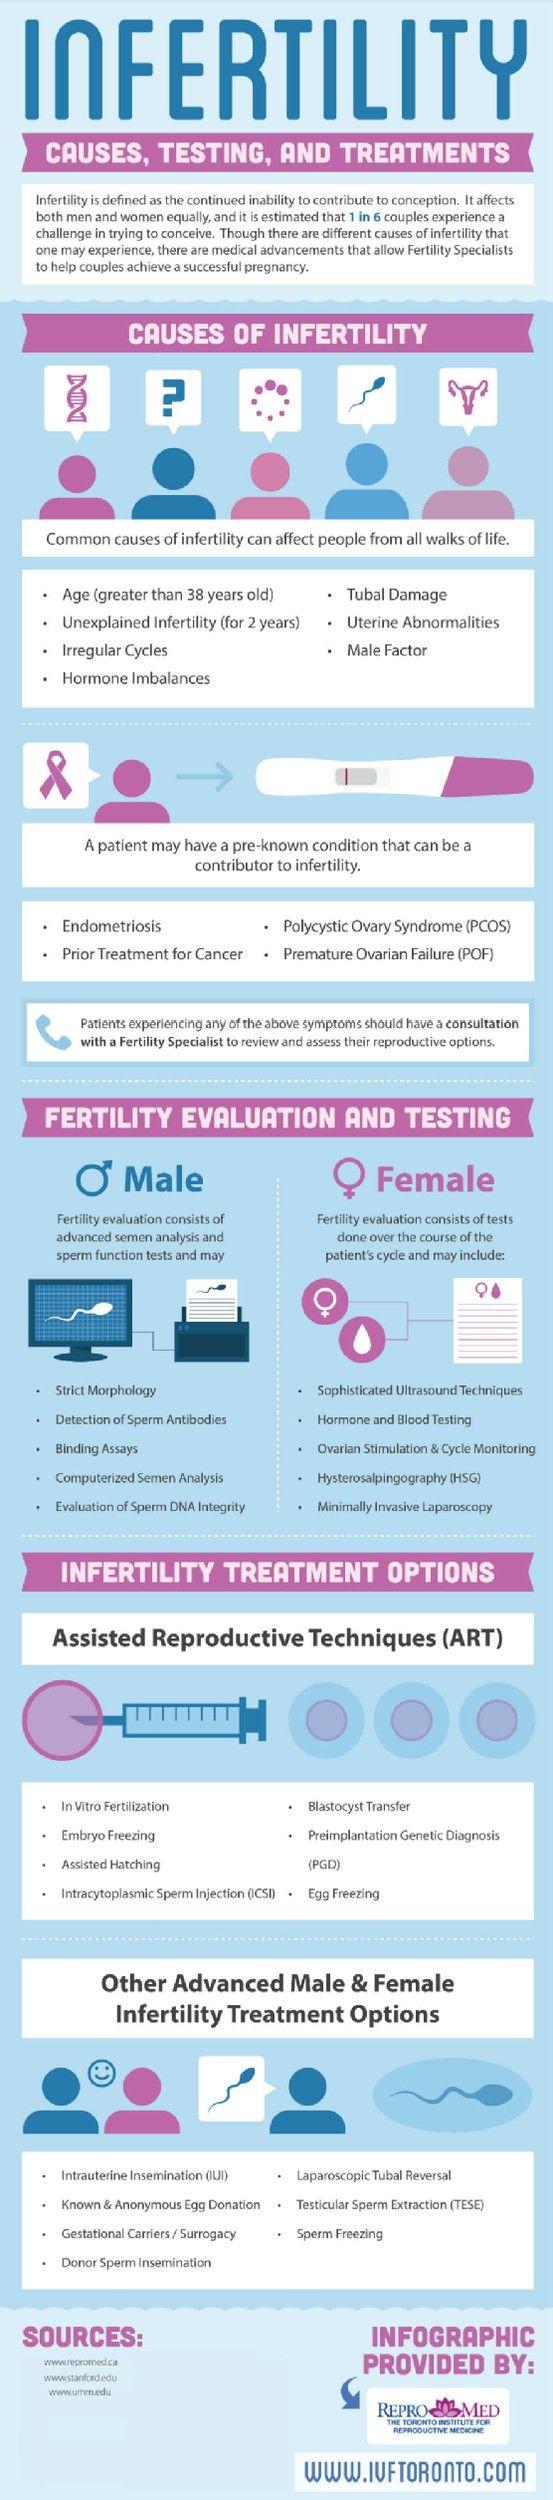 Male infertility ancient ingest sperm